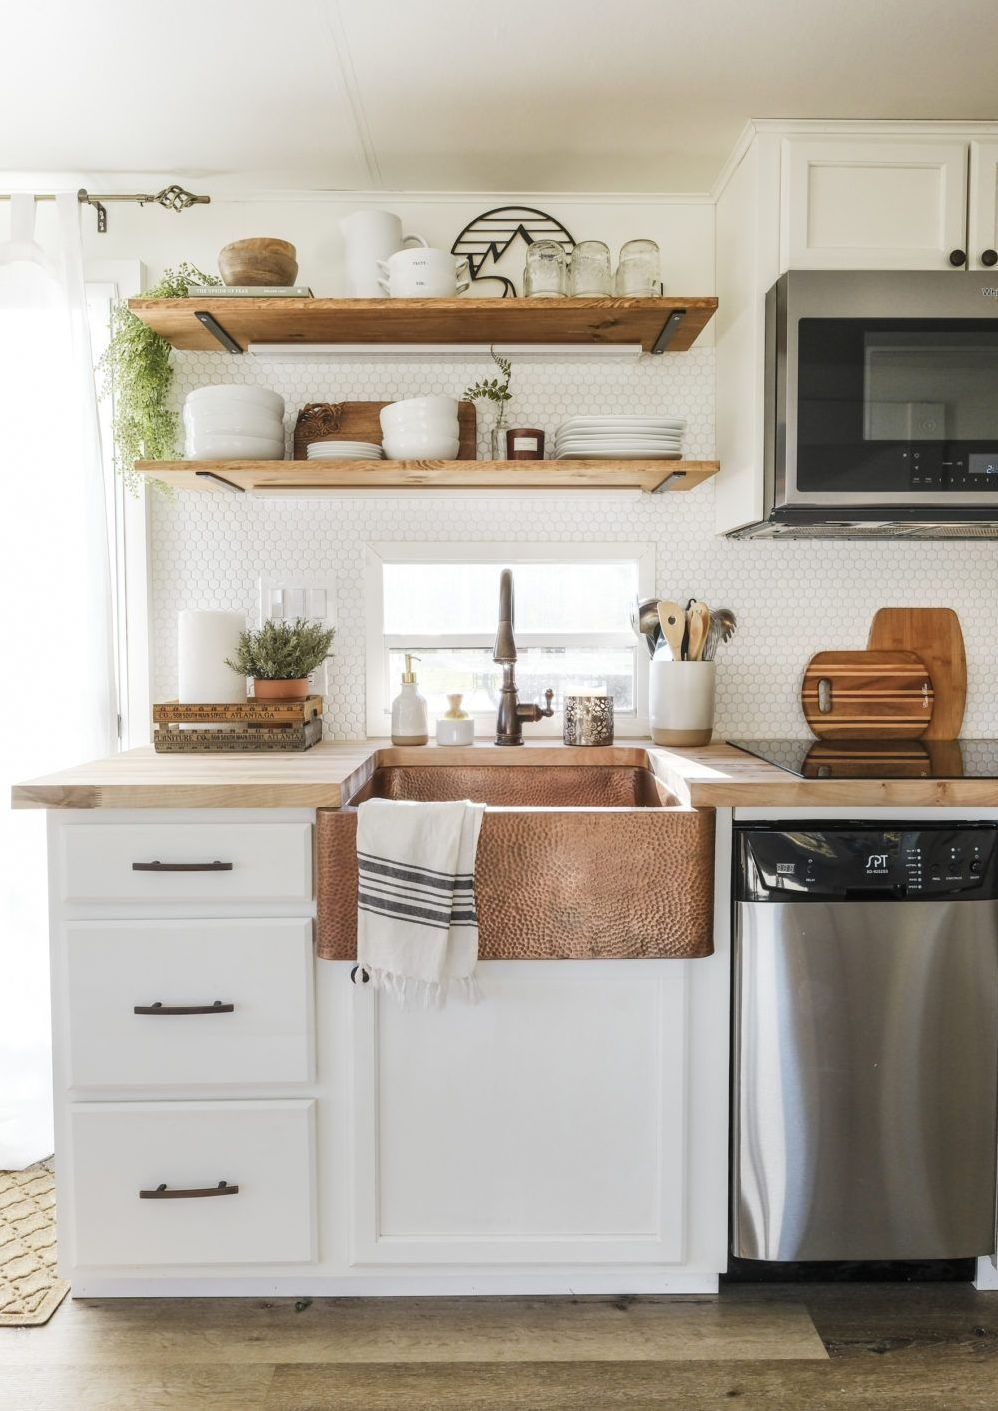 16 rv kitchen ideas you must have kitchen remodel small kitchen design small rv kitchen remodel on kitchen remodel must haves id=98069